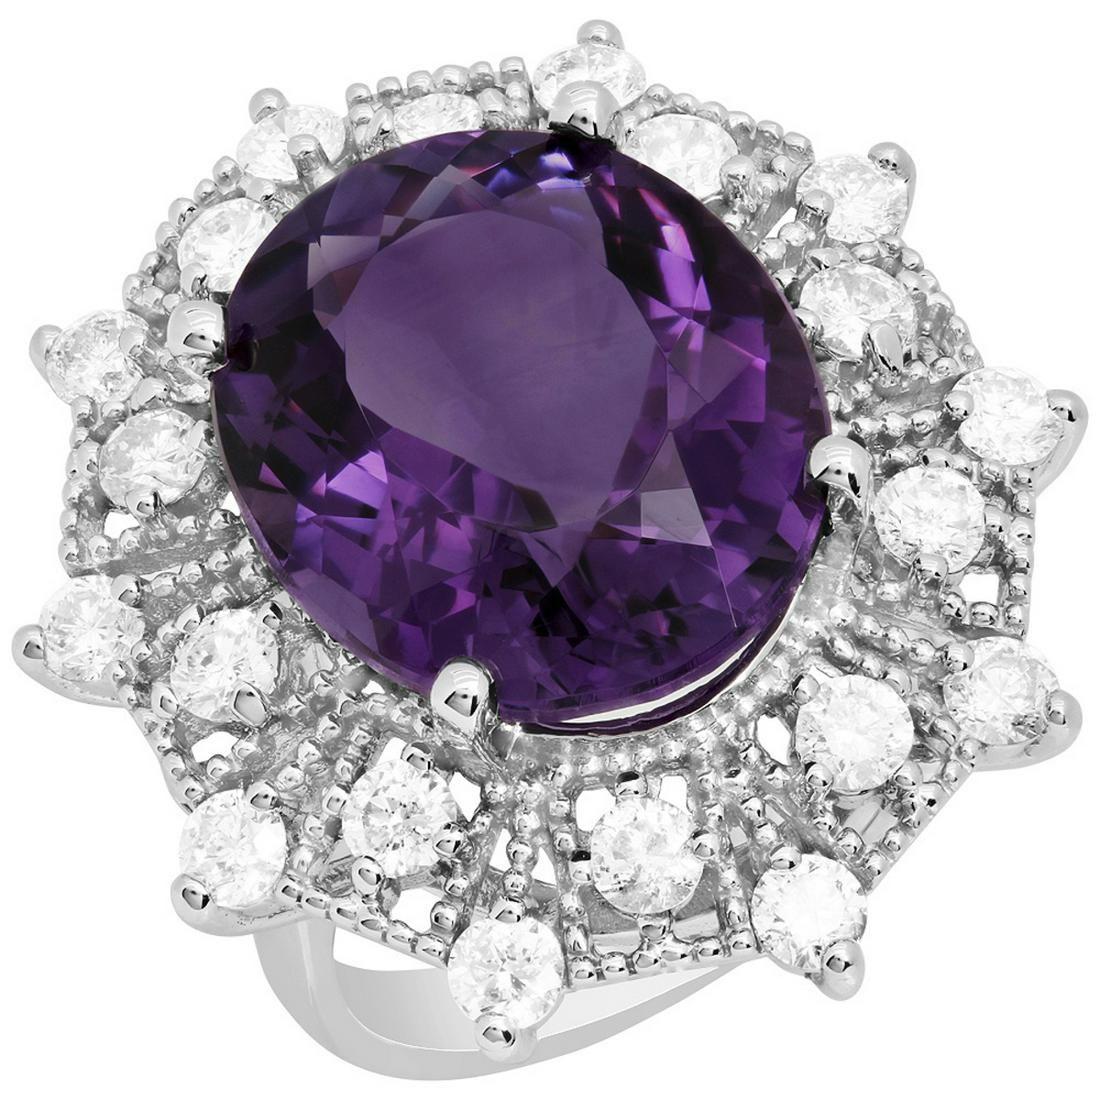 14k White Gold 12.32ct Amethyst 1.86ct Diamond Ring